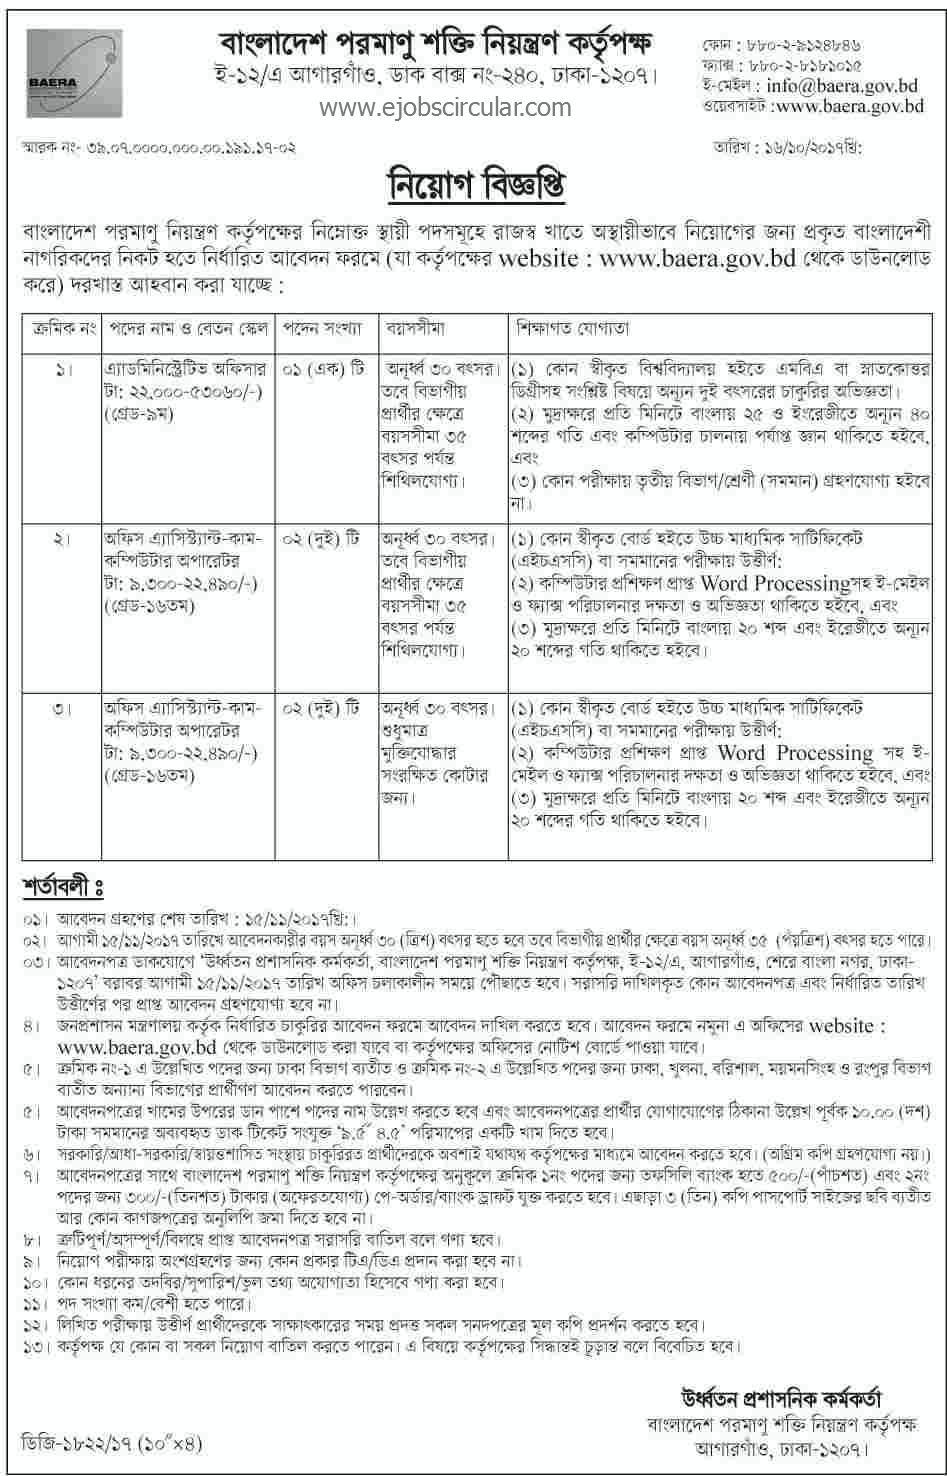 Bangladesh Atomic Energy Commission Job Circular 2017 2